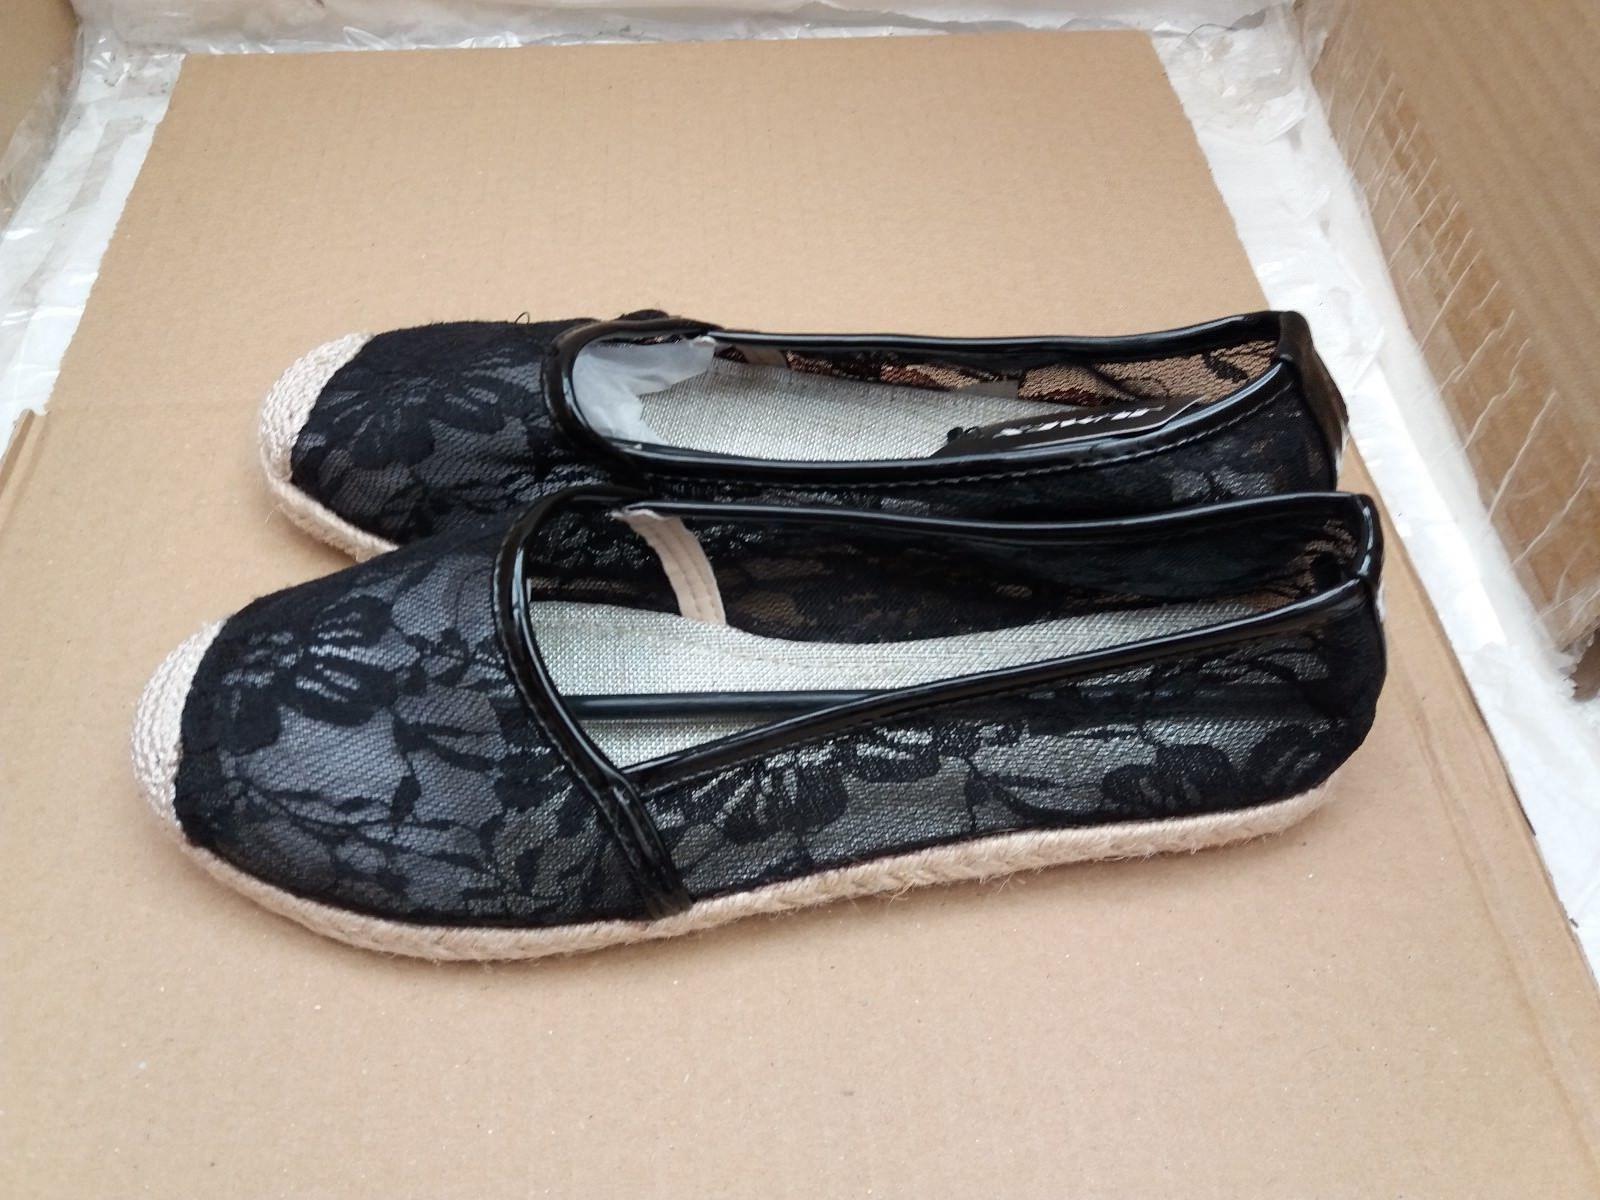 JUMEX Collection Ladies Espadrille Flat Black Shoes - EU 38/UK 5